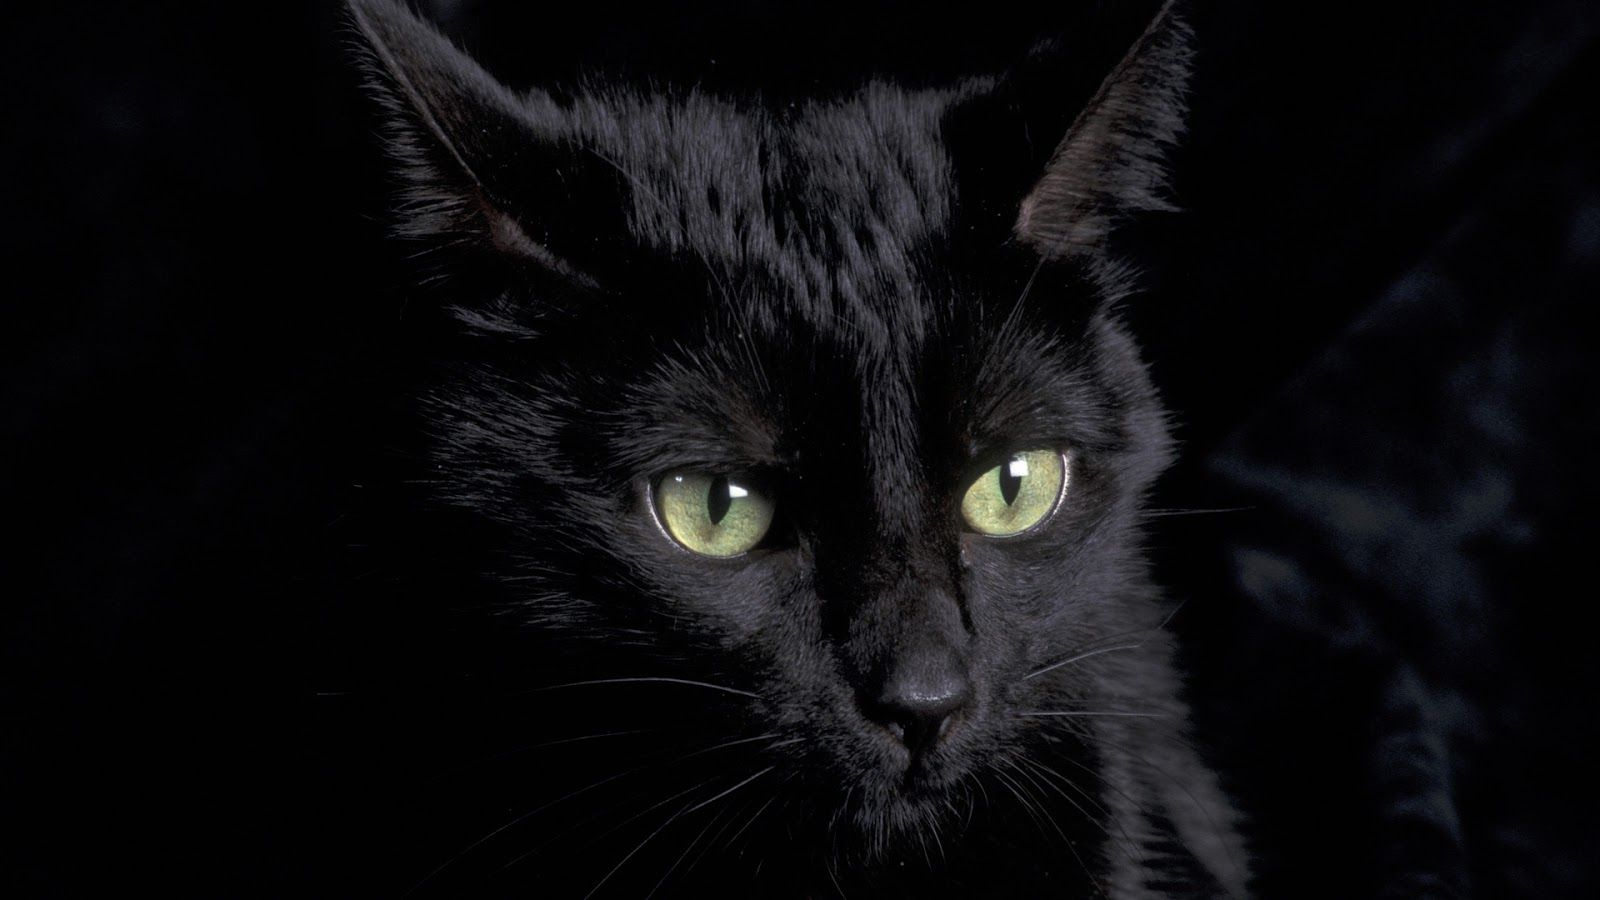 Black Cats Wallpaper Desktop Animal Wallpaperklix Com Cat Wallpaper Cats And Kittens Cats